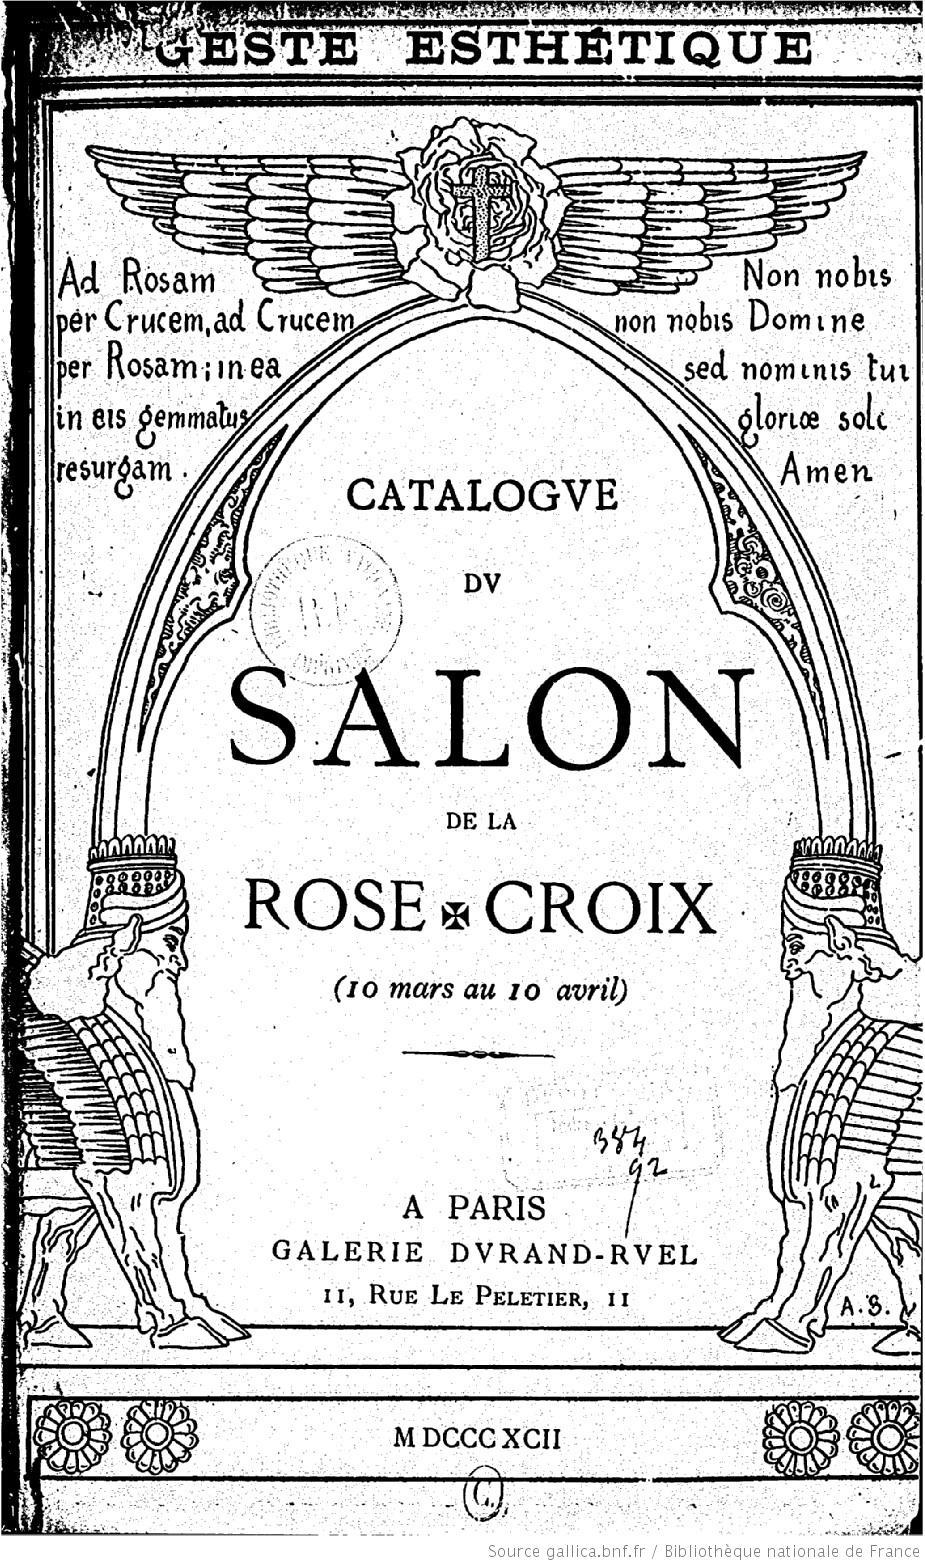 Frontispiece of Salon Catalogue, designed by Alexandre Séon.